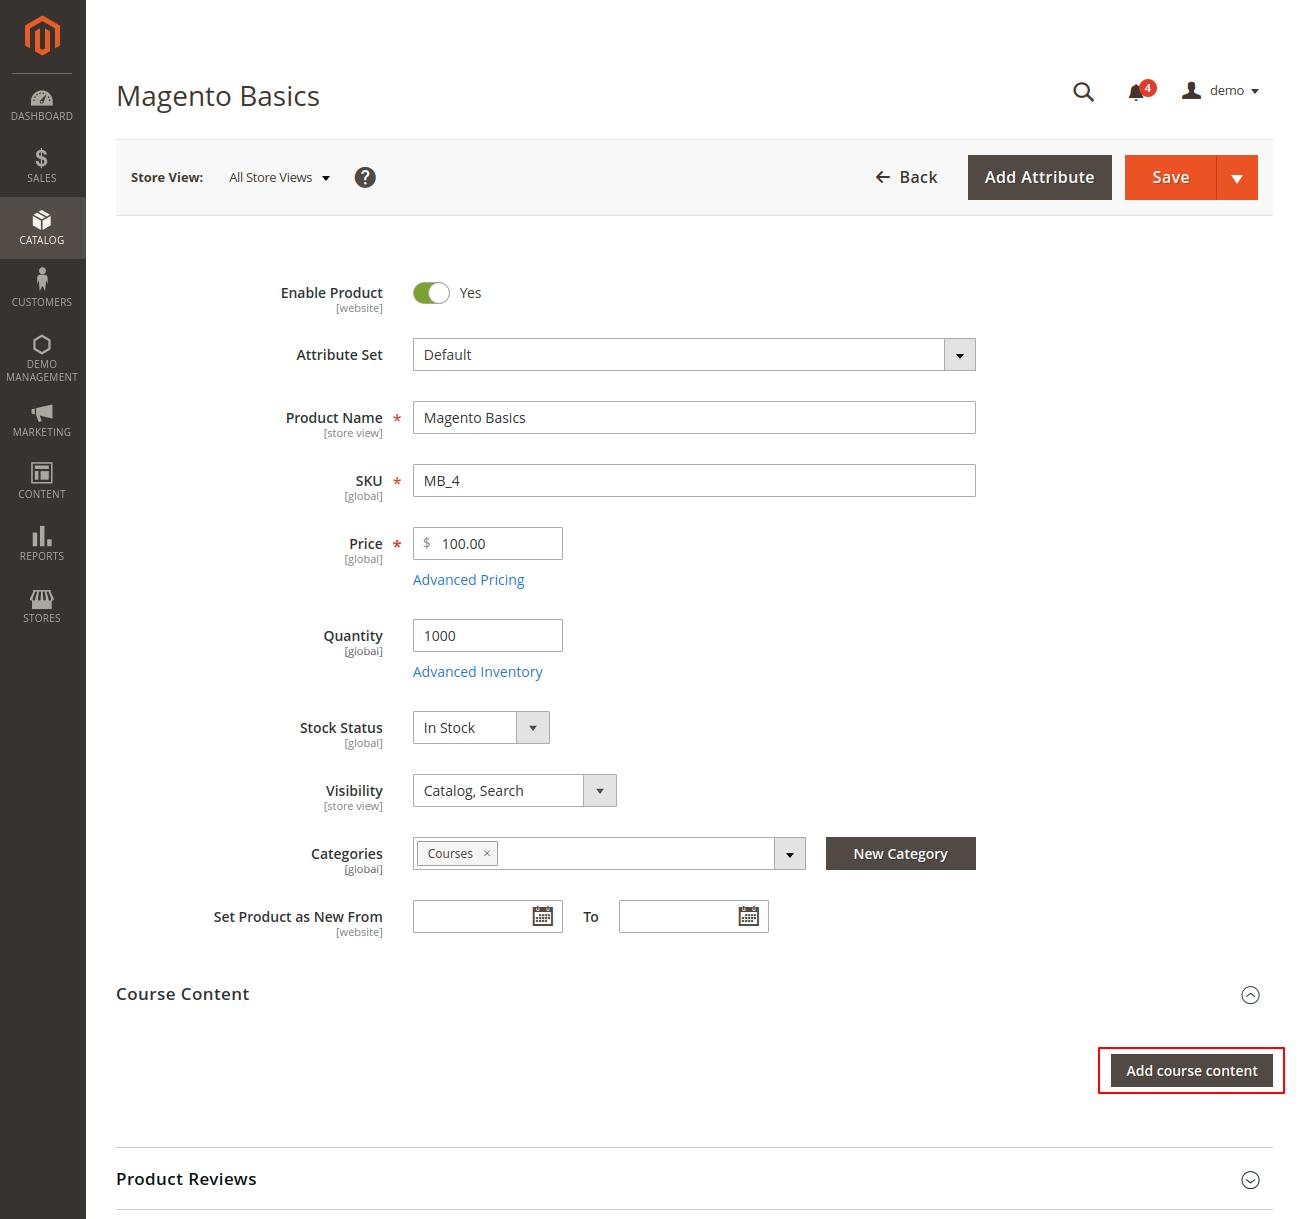 webkul-magento2-learning-management-marketplace-new-course-product-3